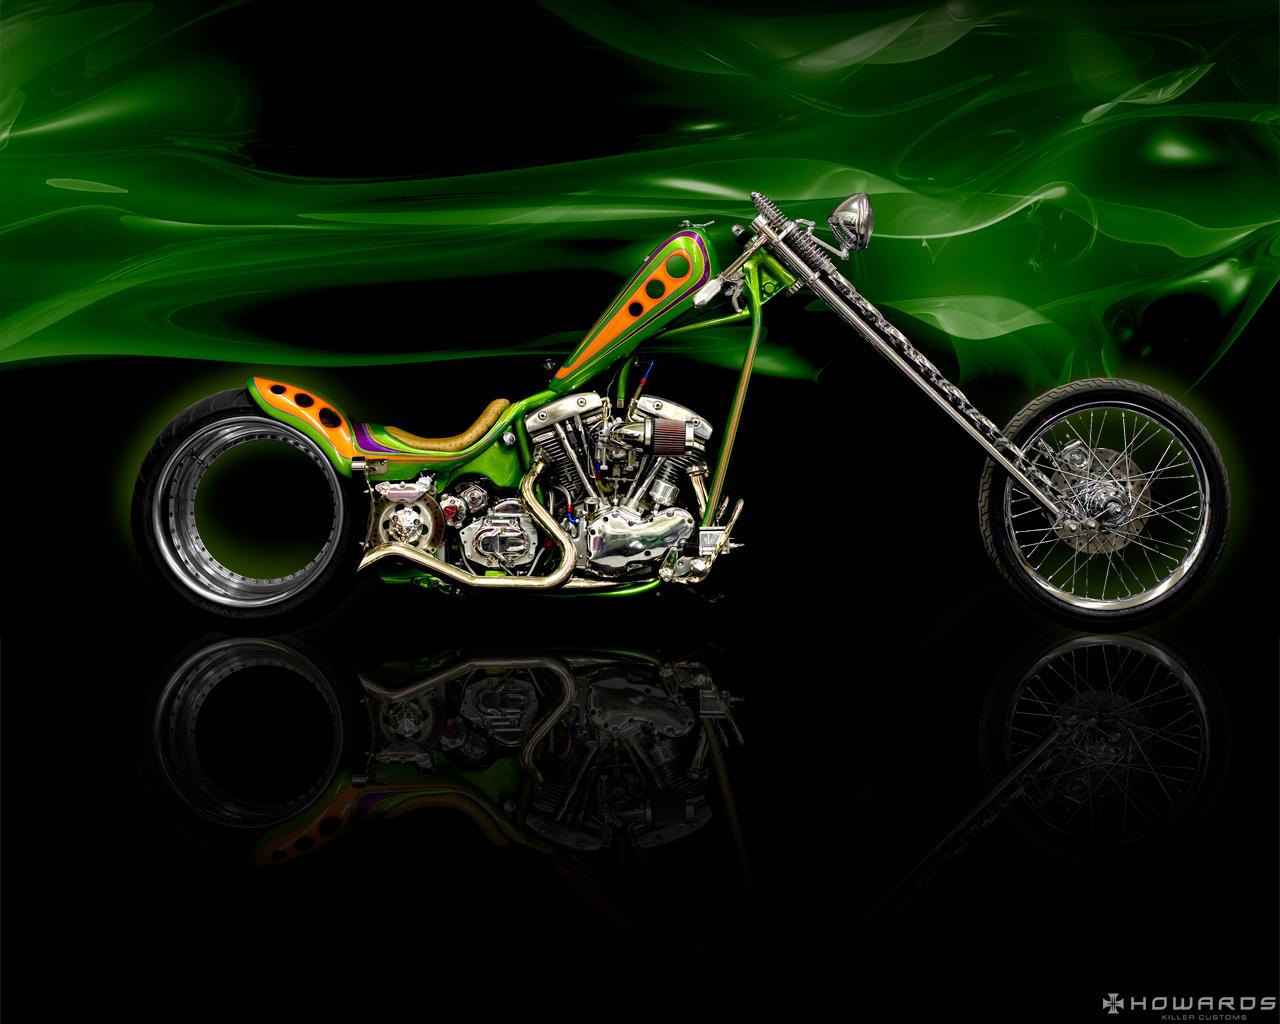 Harley Chopper Wallpaper Harley Davidson Chopper 1280x1024